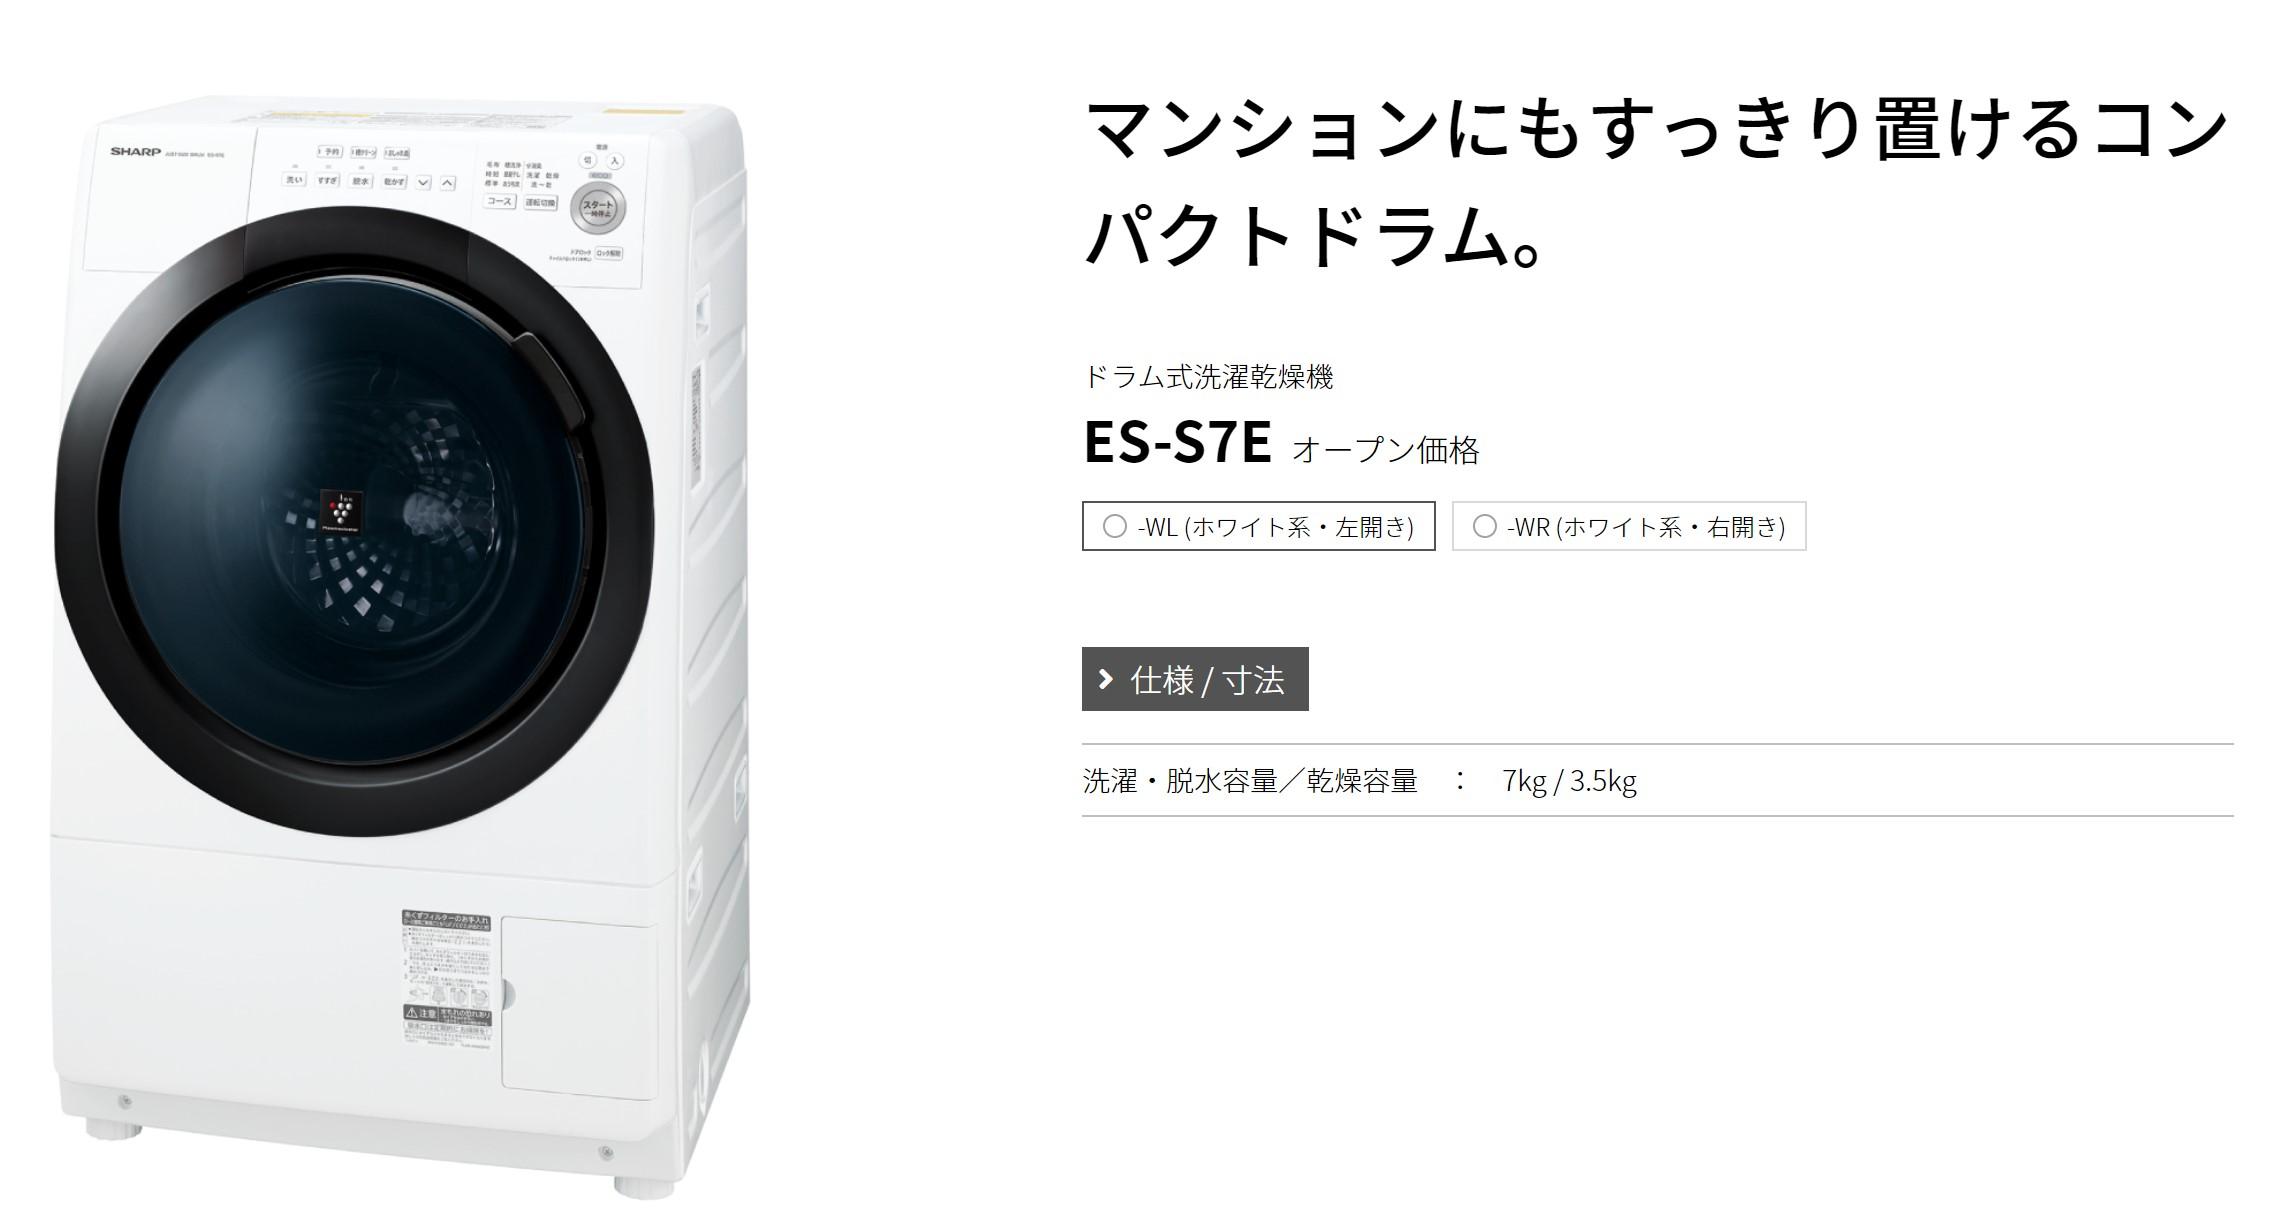 SHARP ES-S7Eの最大洗濯容量・最大乾燥容量